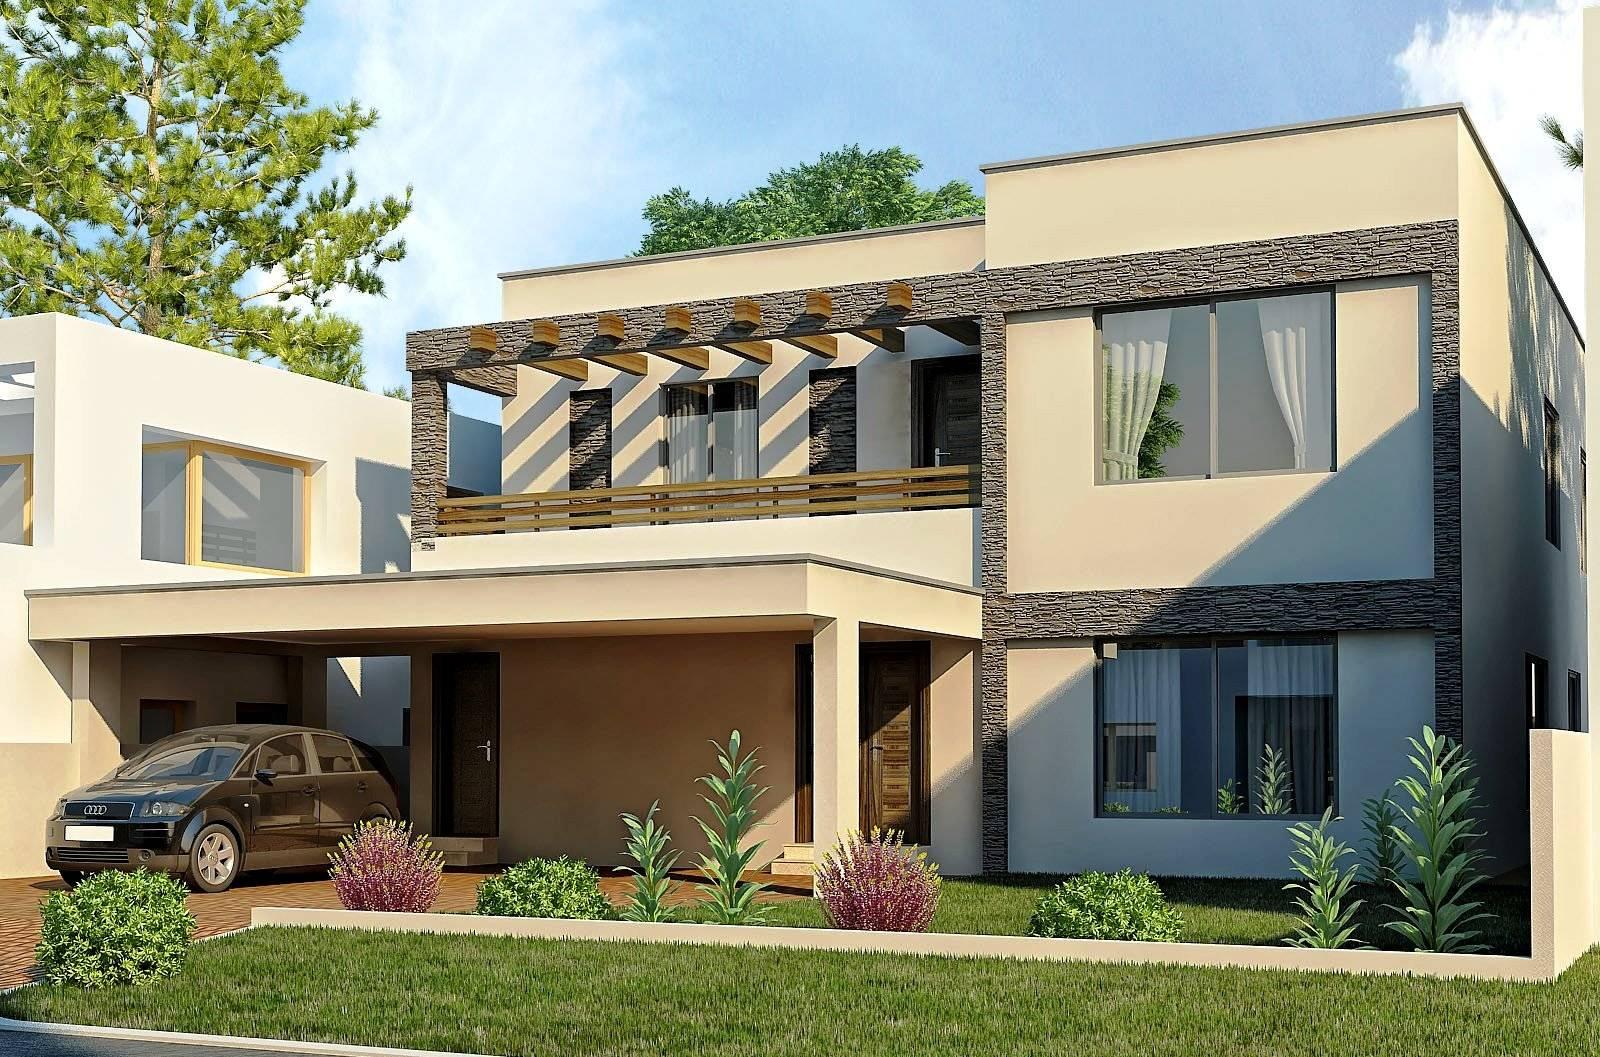 Modern Homes Exterior Designs Views Home Ideas House Plans 29251